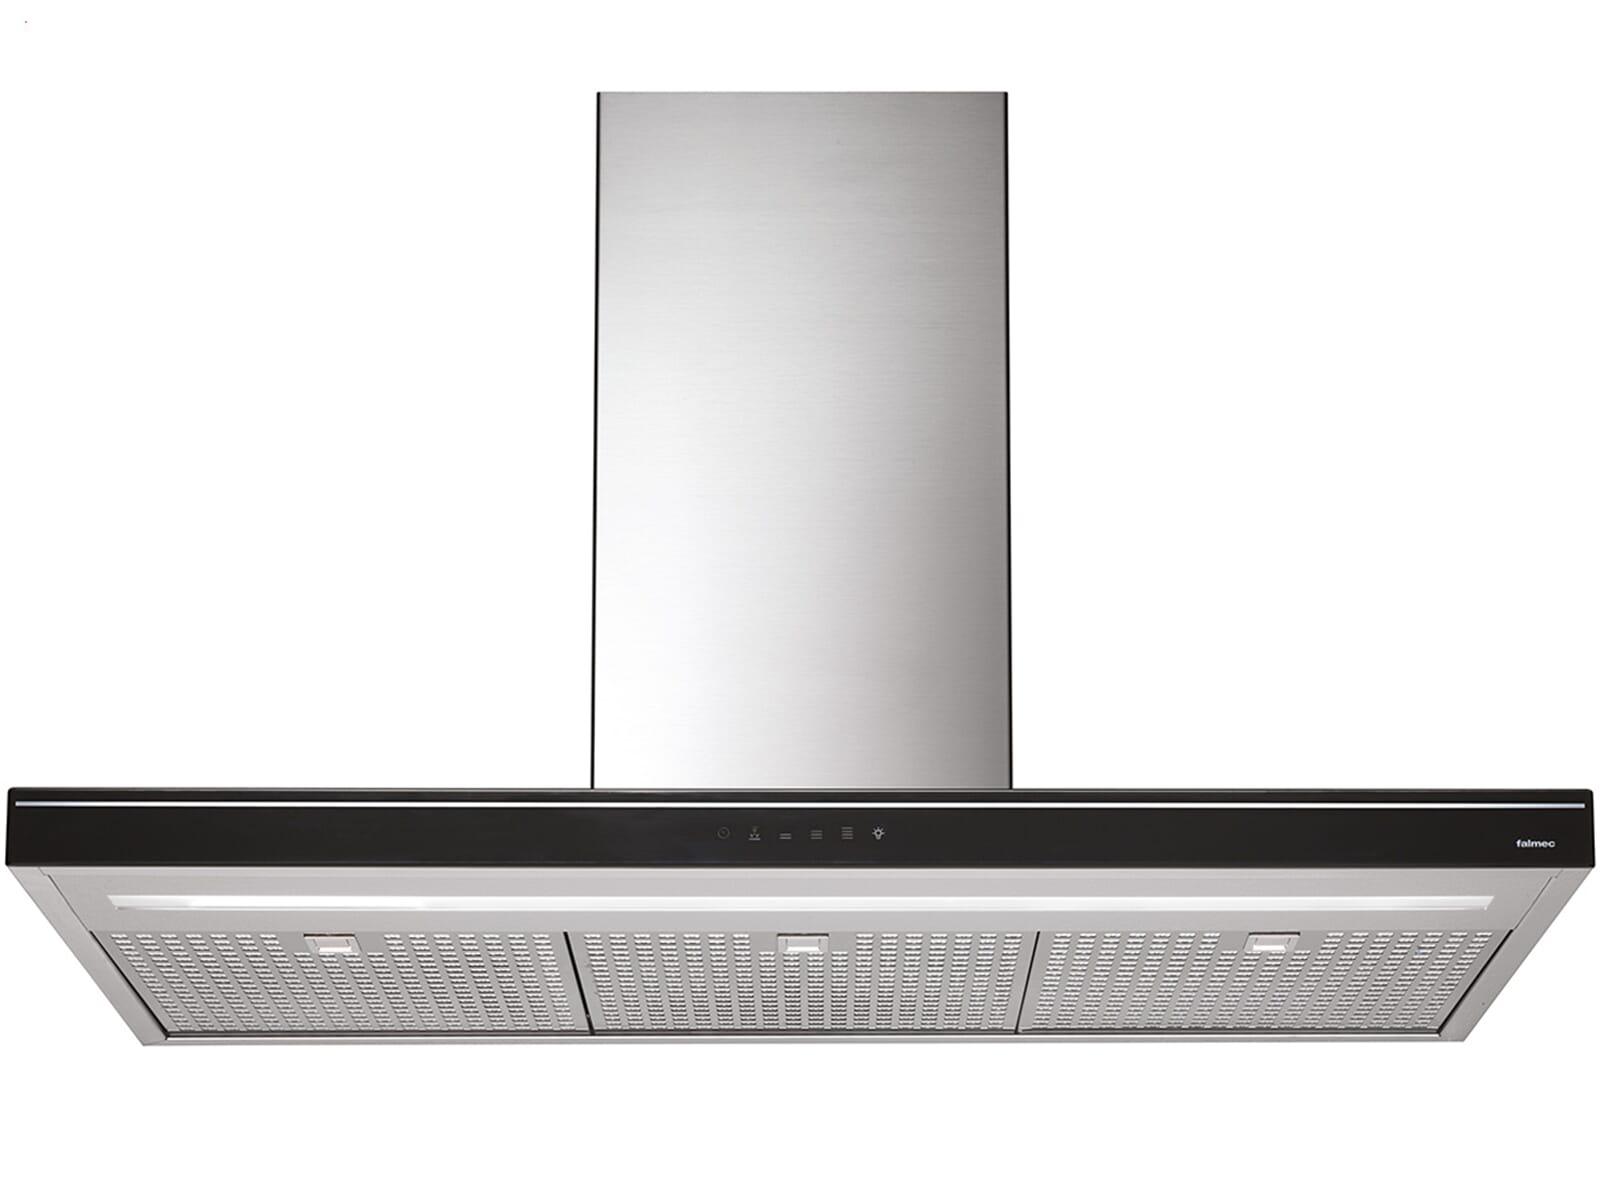 falmec luce insel dunstabzugshaube edelstahl schwarz f r 1349 10 eur. Black Bedroom Furniture Sets. Home Design Ideas